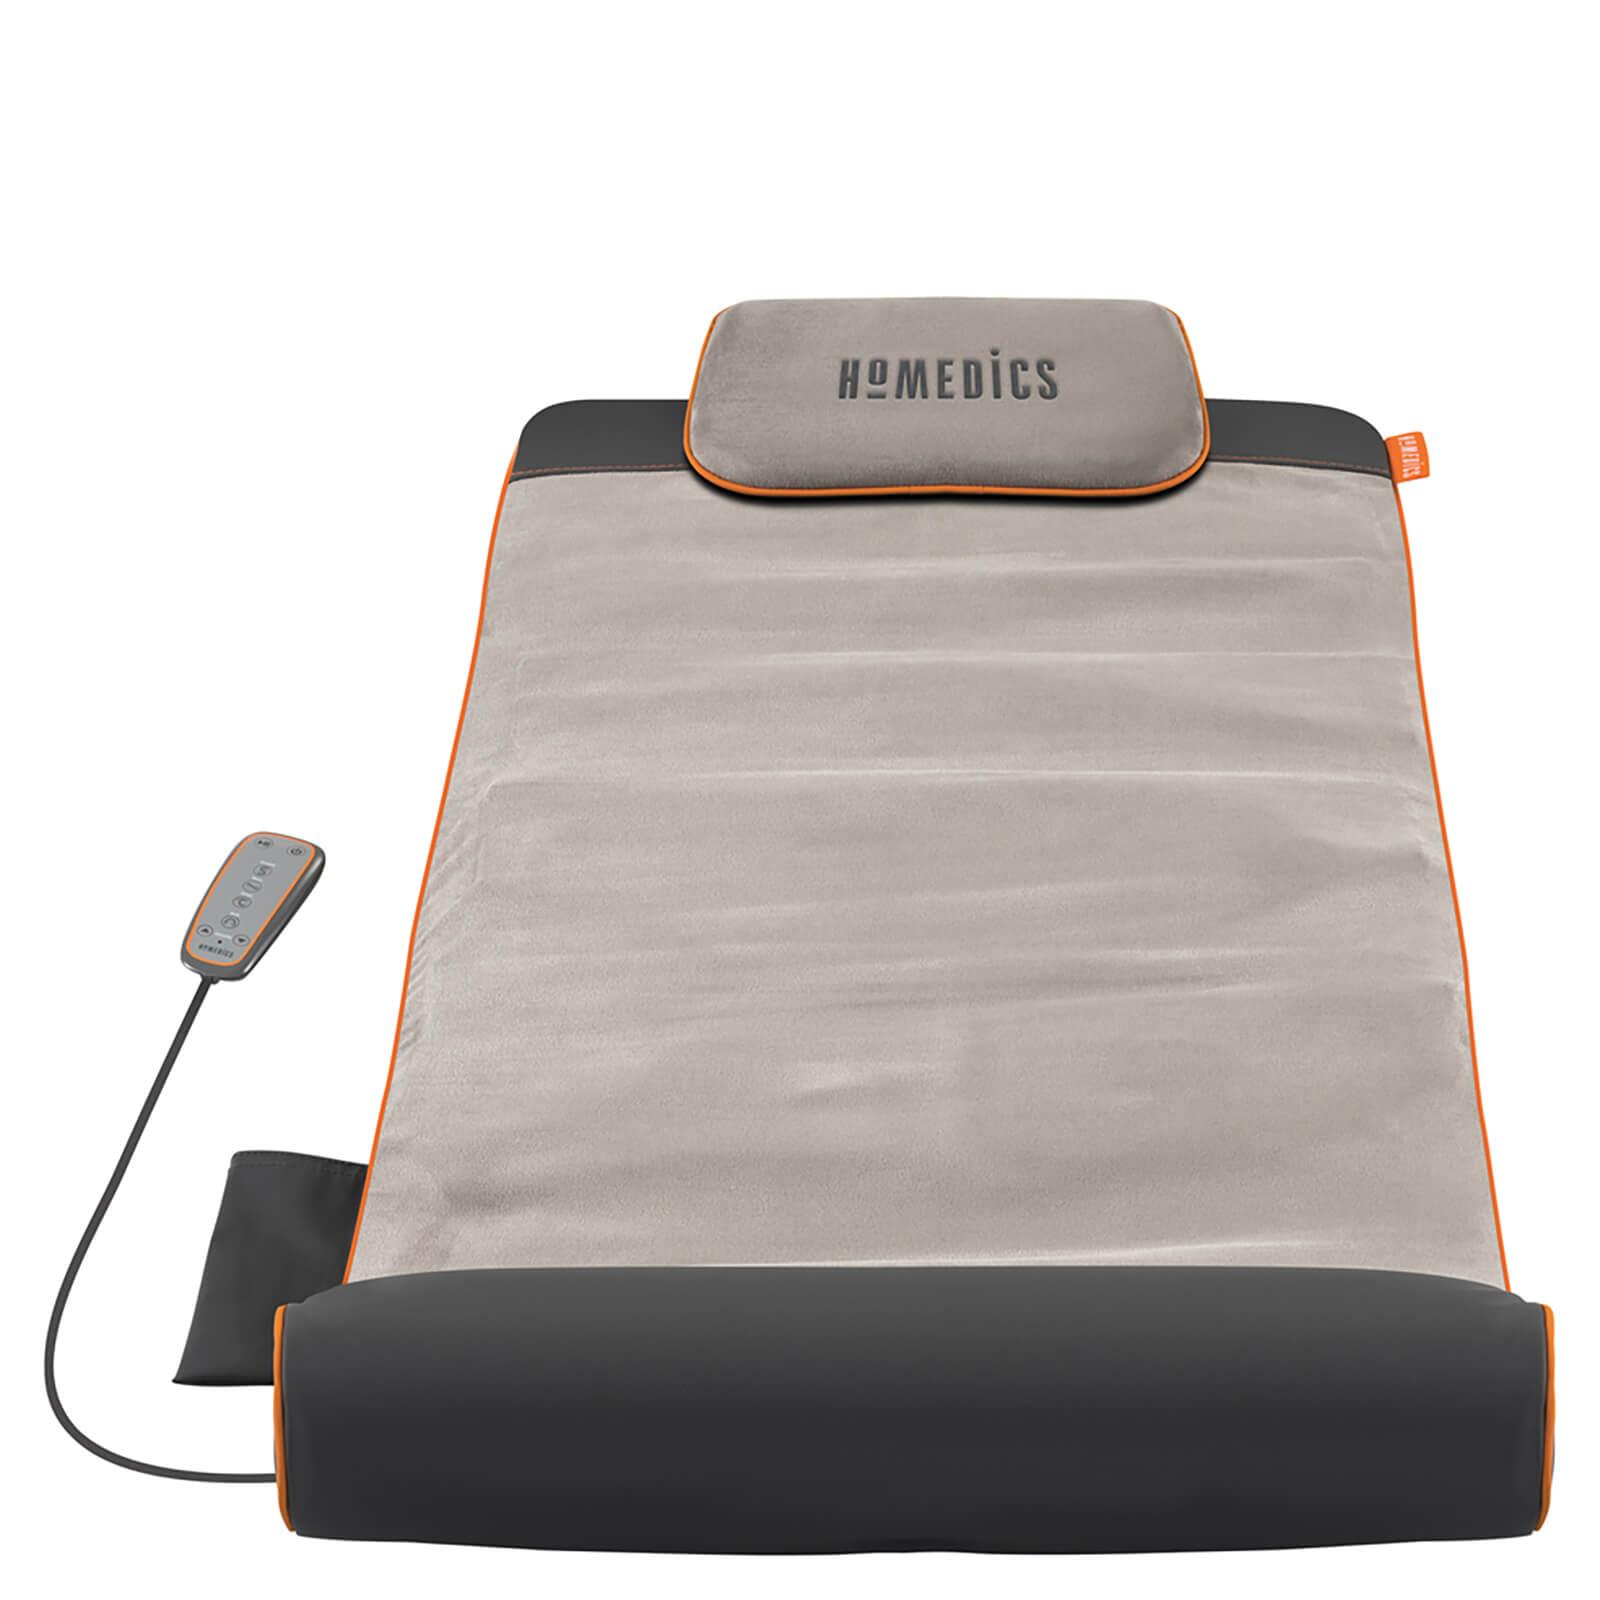 HoMedics Stretch Back tappetino massaggiante